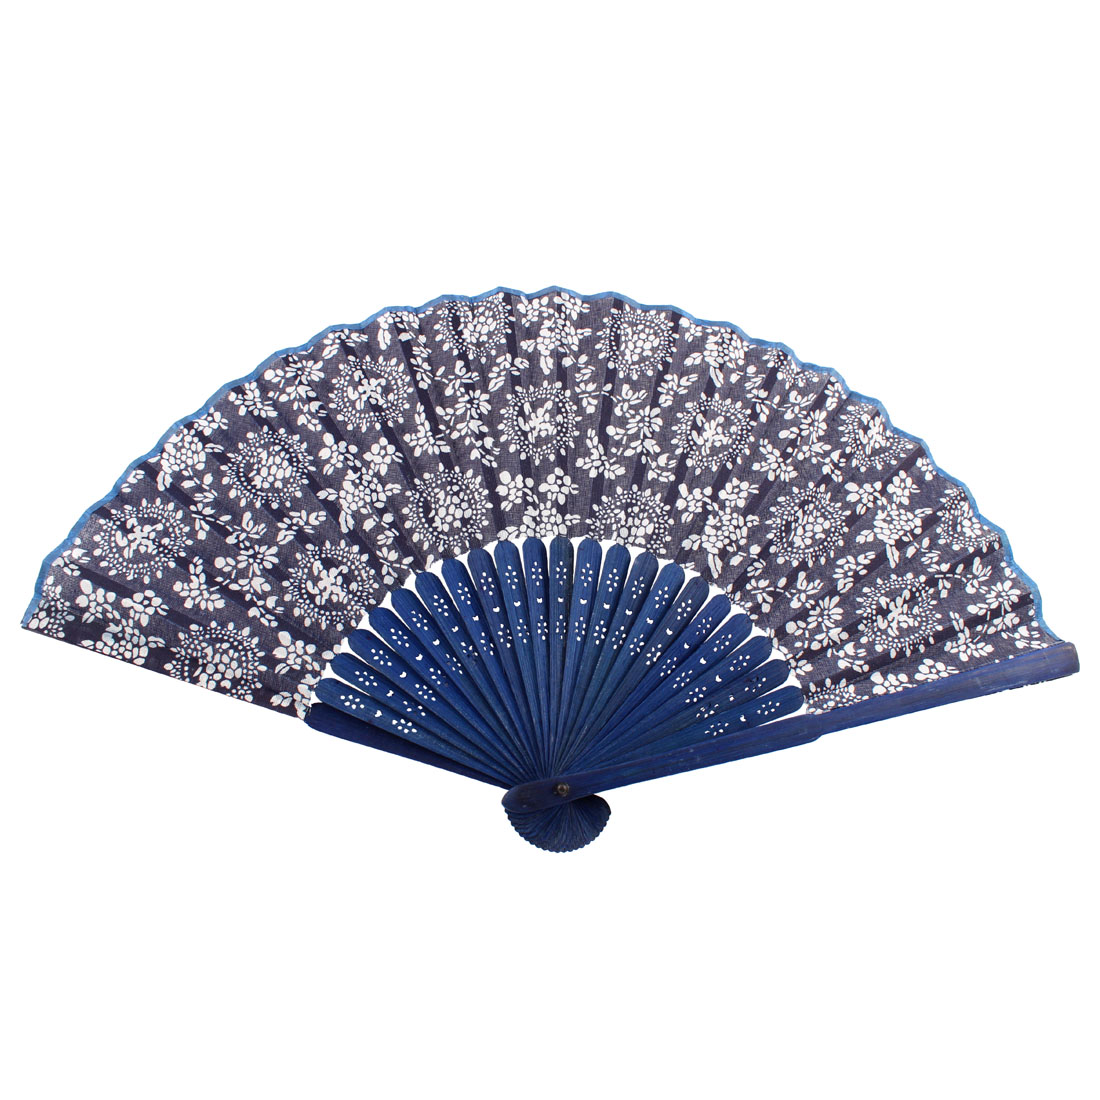 Bamboo Handle Fabric White Flower Print Folding Hand Fan Navy Blue